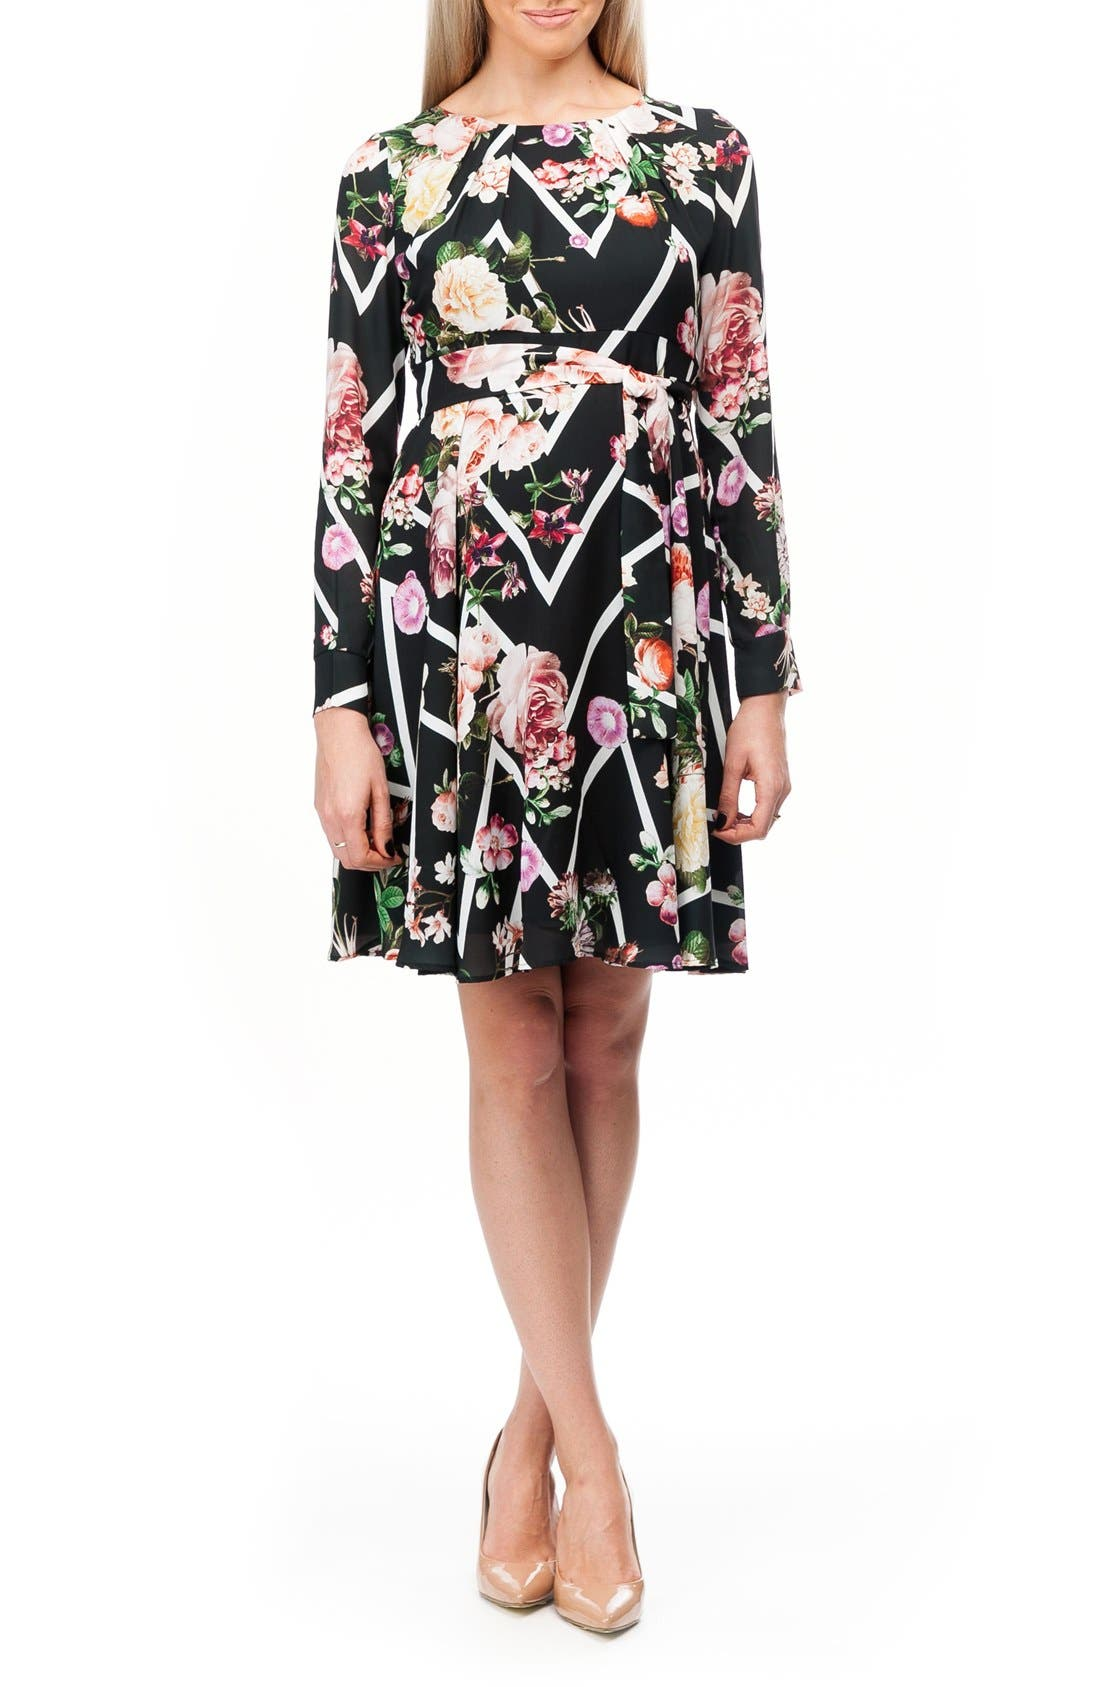 Alternate Image 1 Selected - PIETRO BRUNELLI Stresa Chiffon Maternity Dress